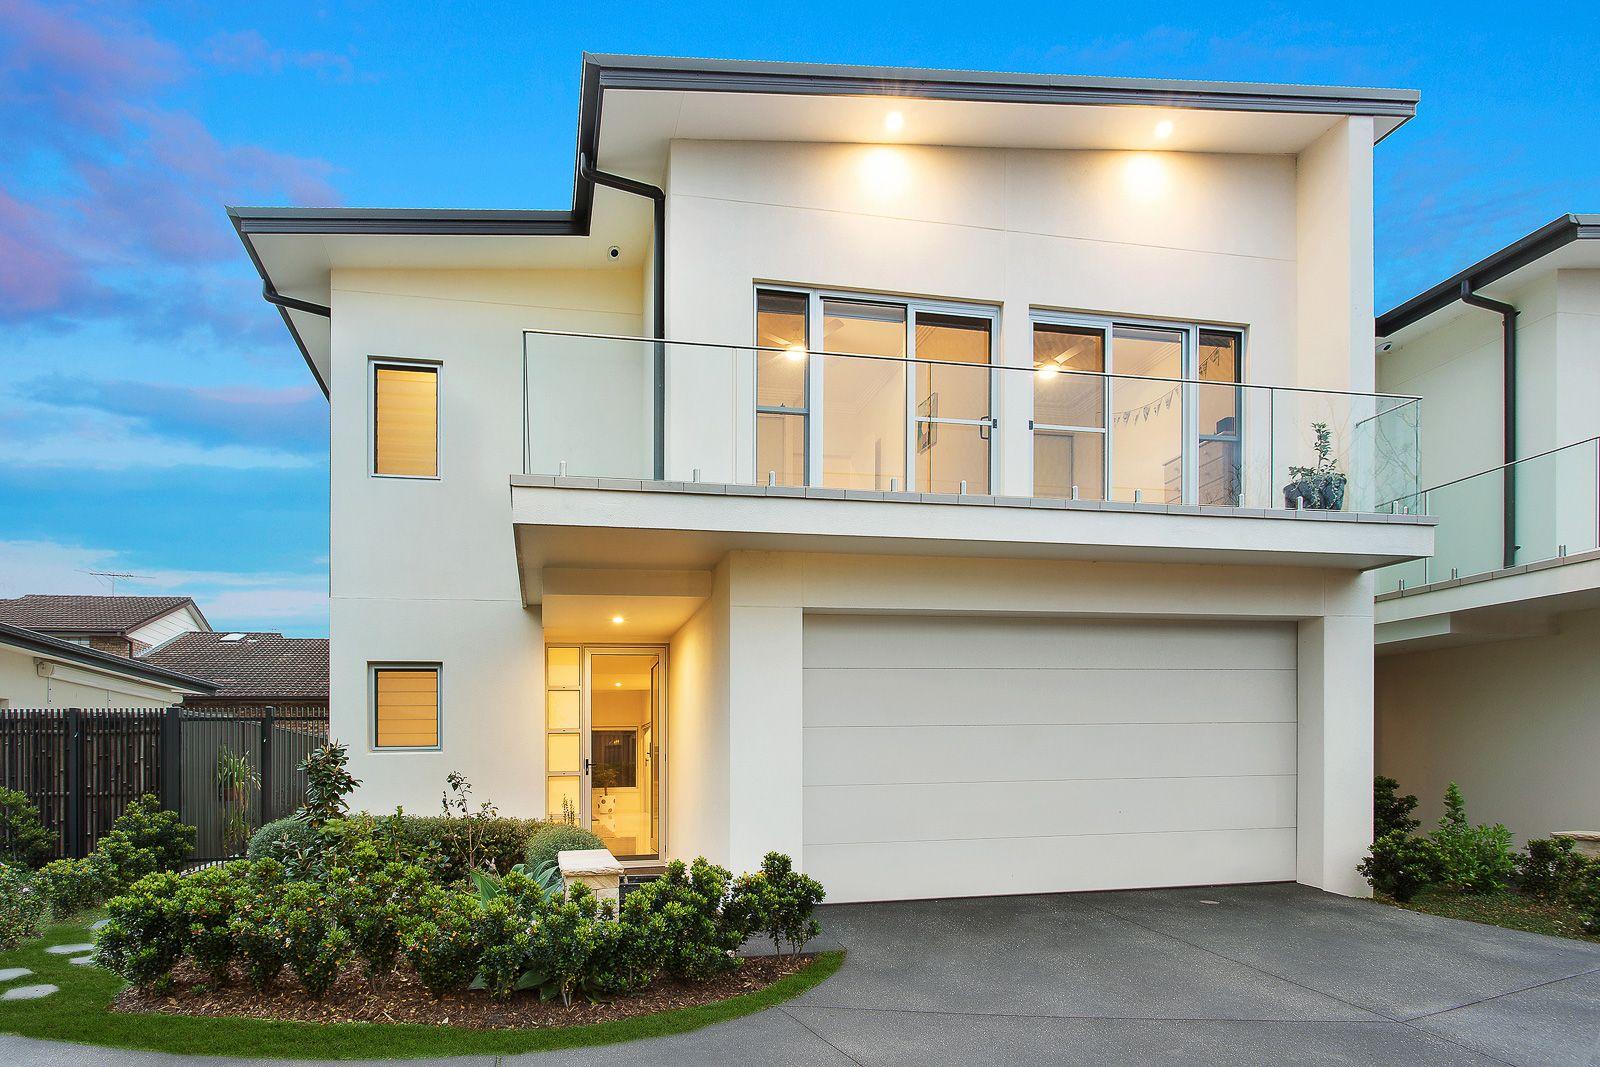 4/75 Caringbah Road, Caringbah NSW 2229, Image 0